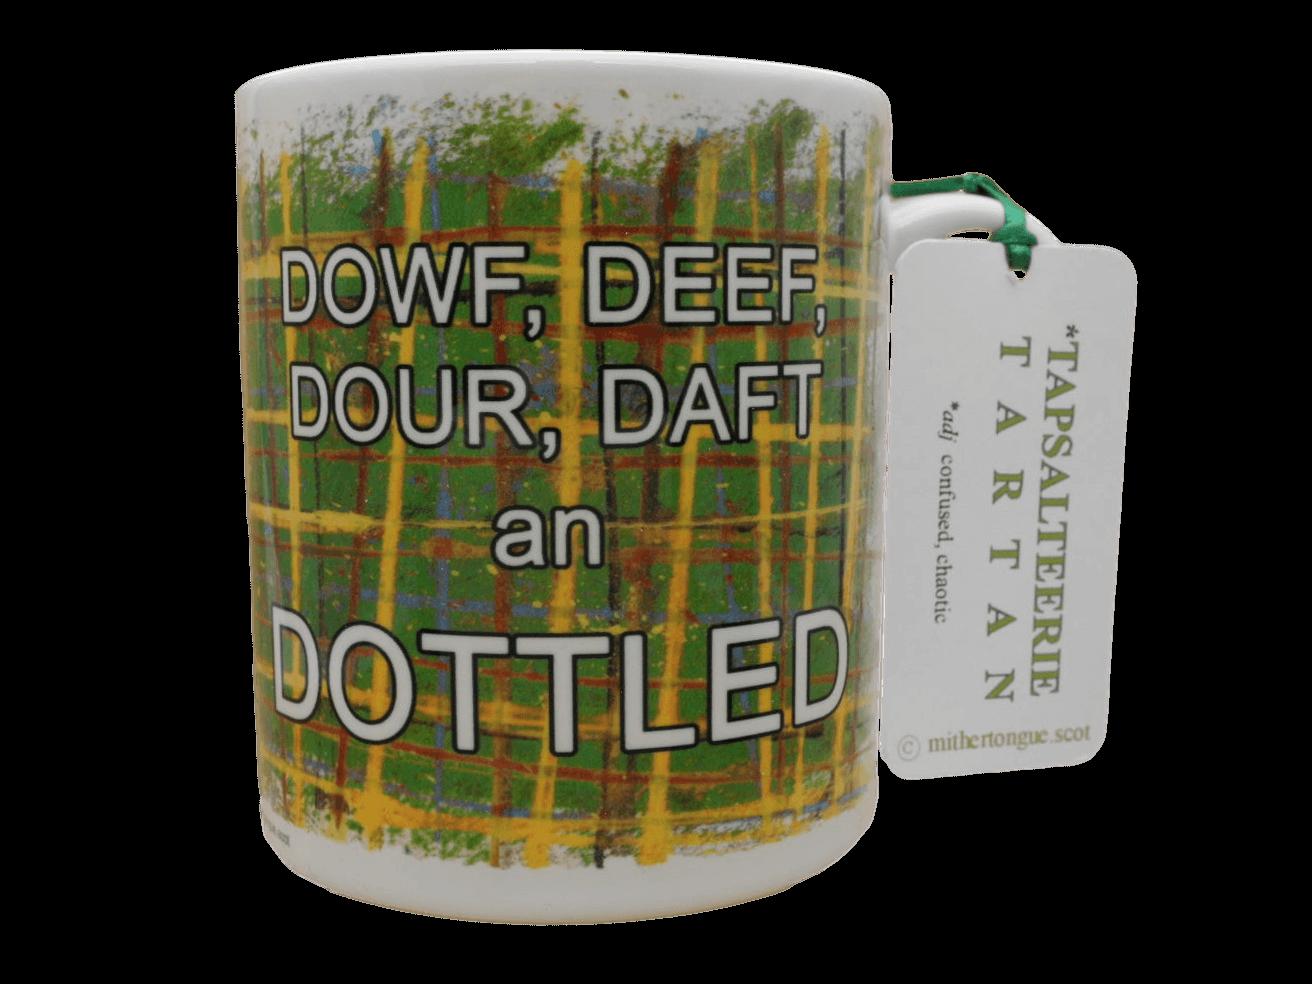 Scottish gift Scots Doric language tartan ceramic mug dowf deef dour daft dottled green